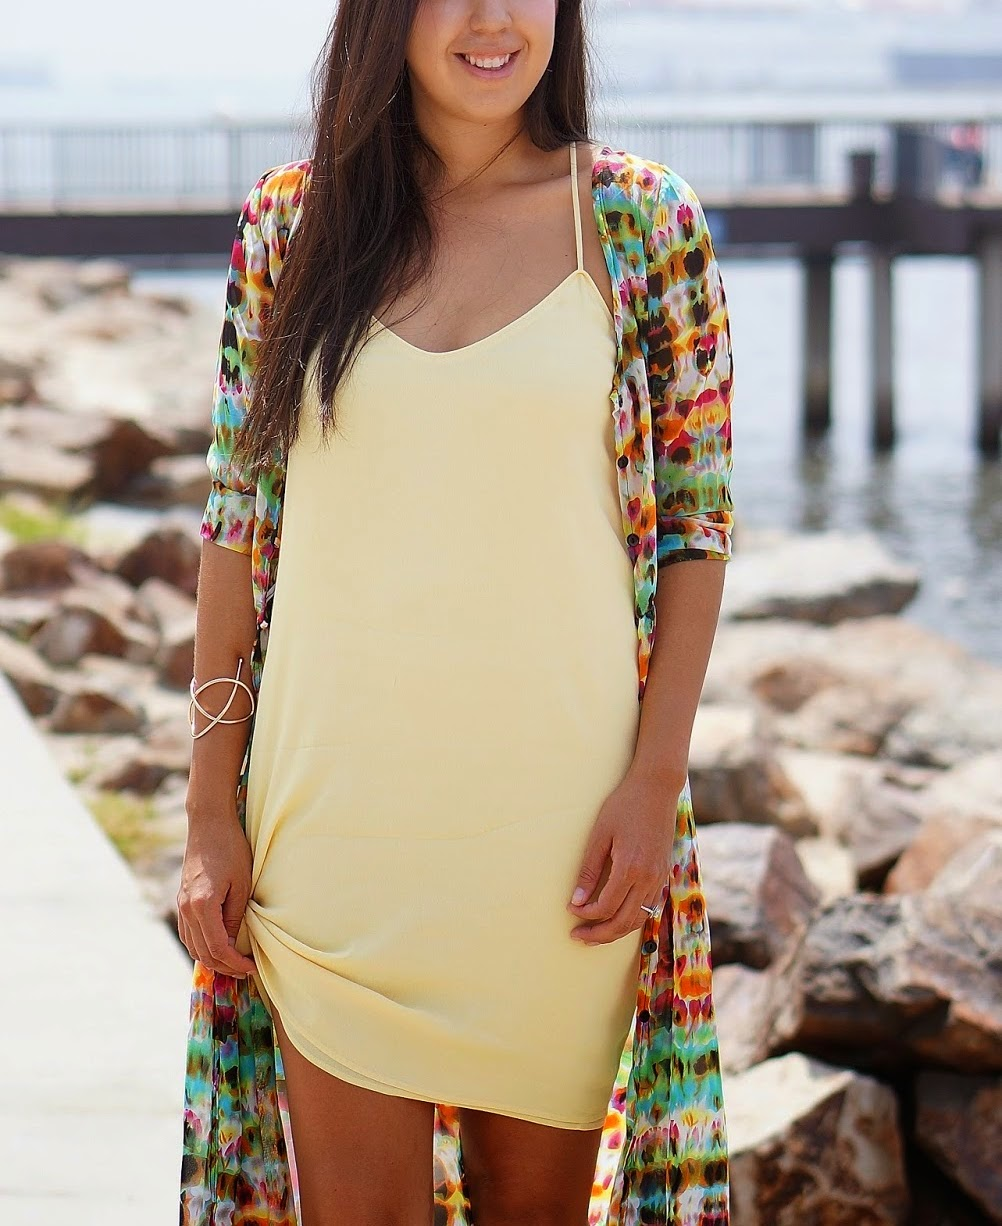 Yellow summer dress, Shoedazzle shoes, Tie Dye Cardigan